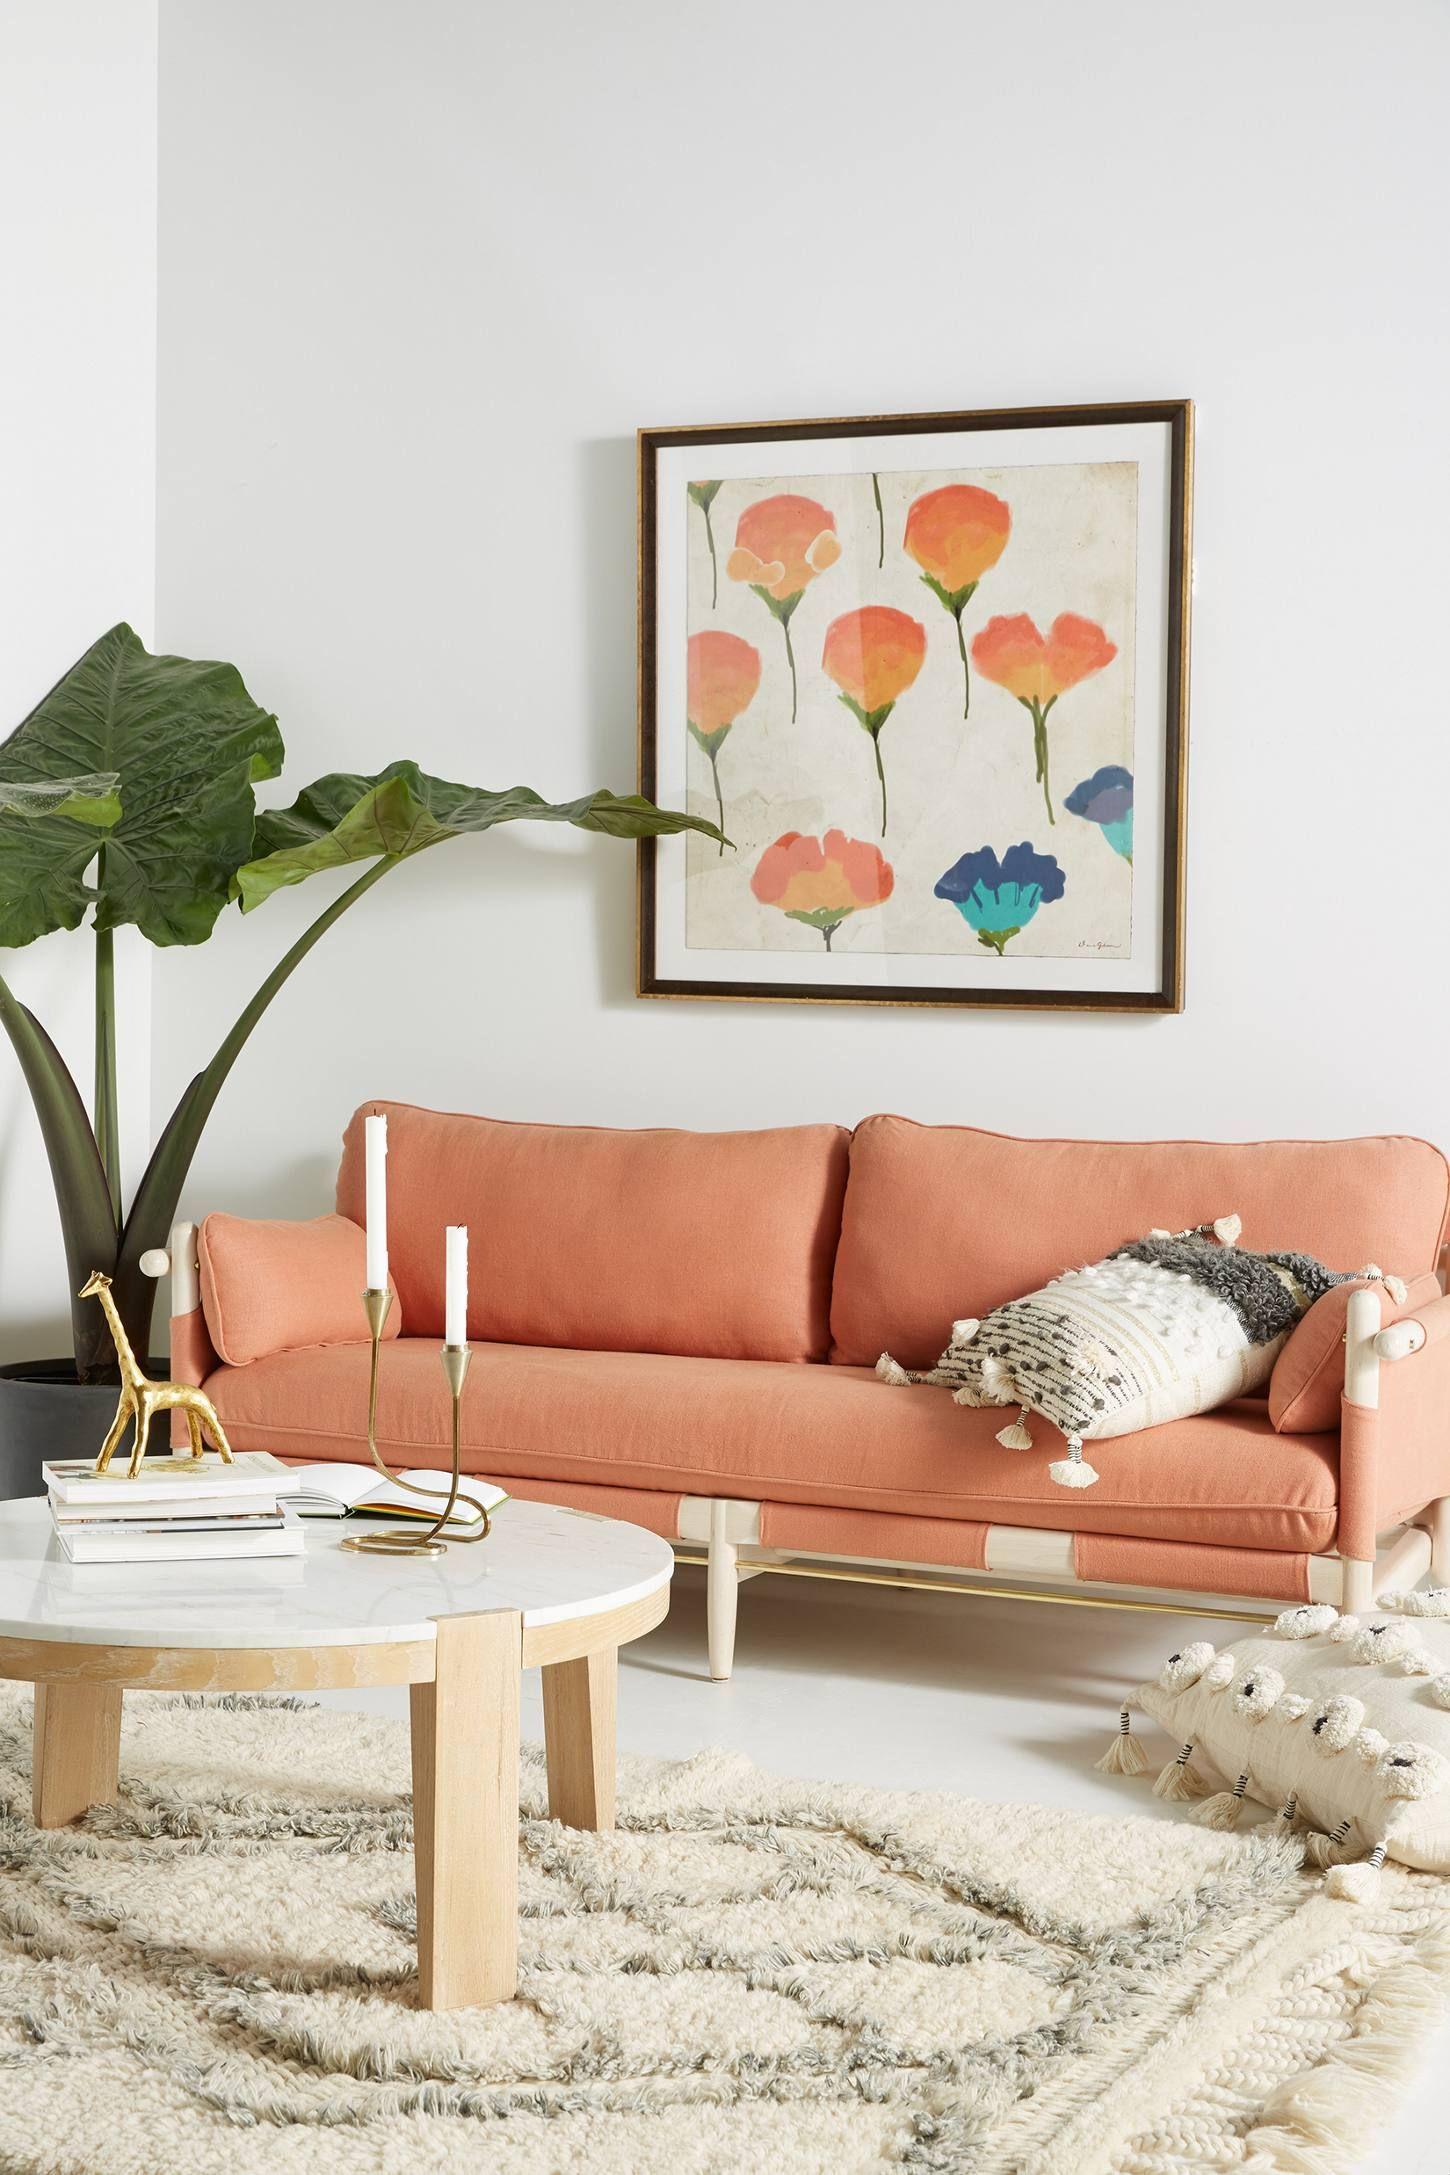 Belgian Linen Jamaica Sofa Anthropologie Classy Decor Living Room Designs Home Decor Download anthropologie living room